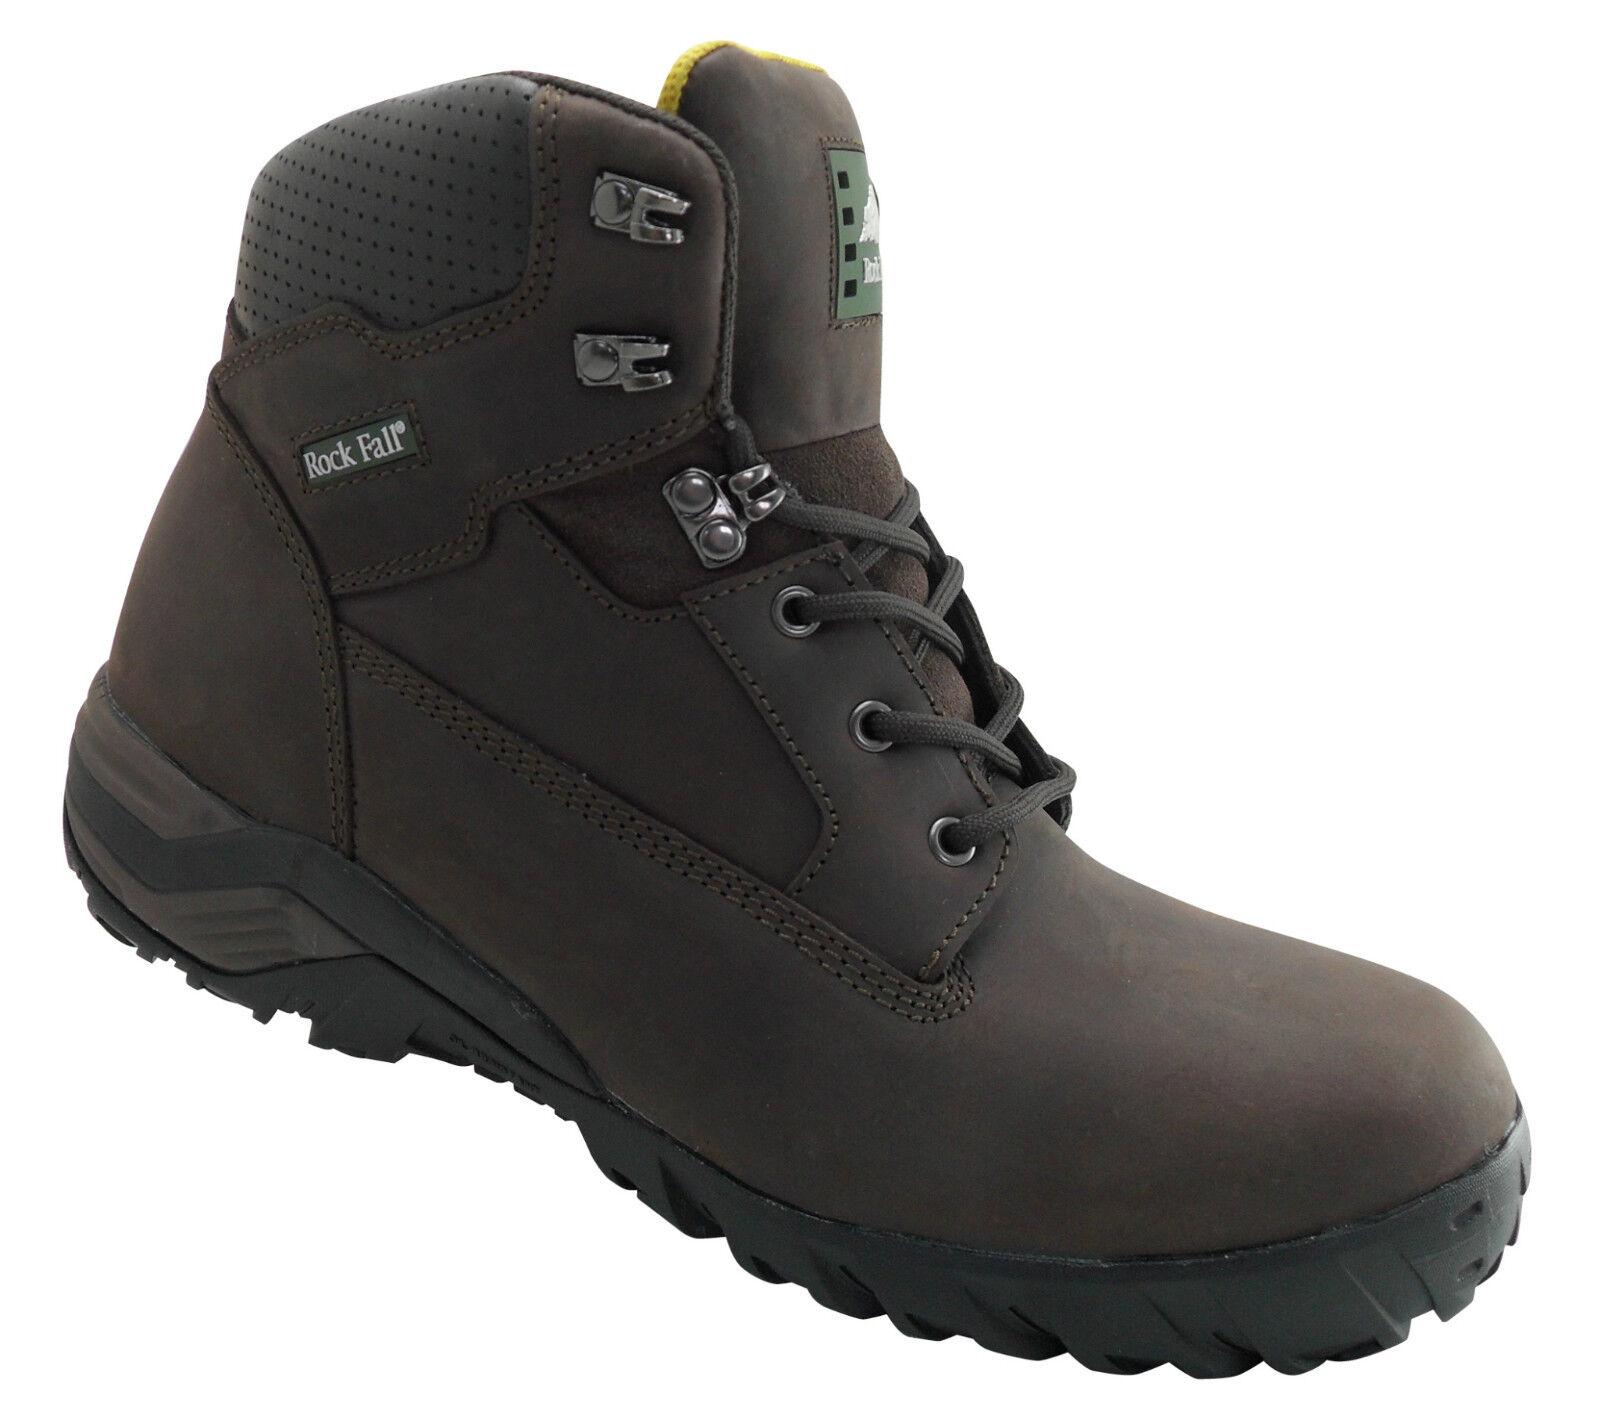 Rock Fall Flint Braun S3 SRA Composite Toe Cap Hiker Safety Stiefel Work Stiefel PPE